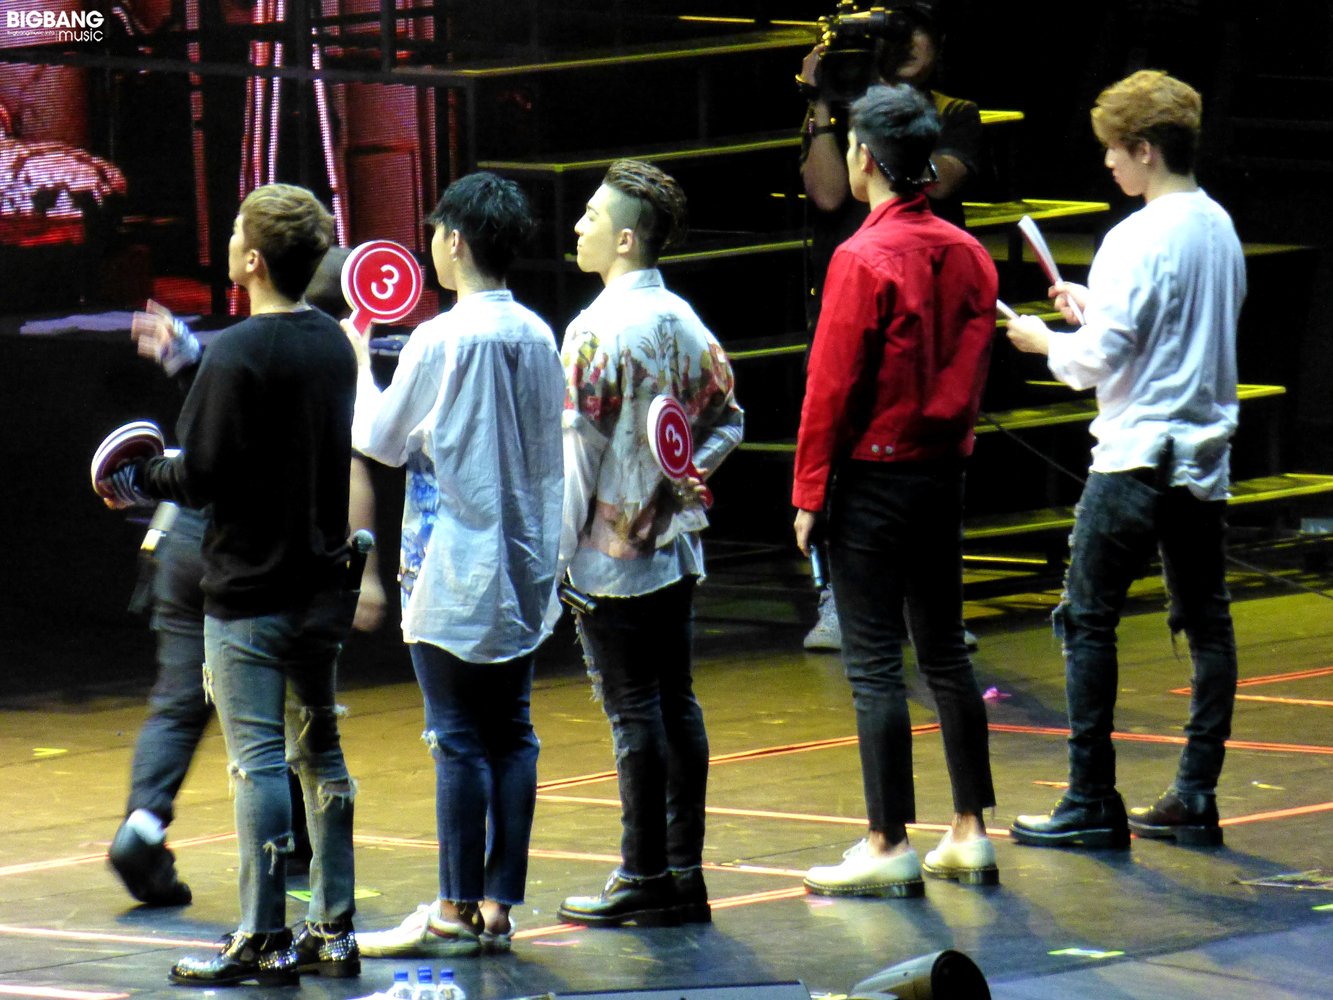 BIGBANGmusic-BIGBANG-FM-Hong-Kong-Day-2-2016-07-23-23